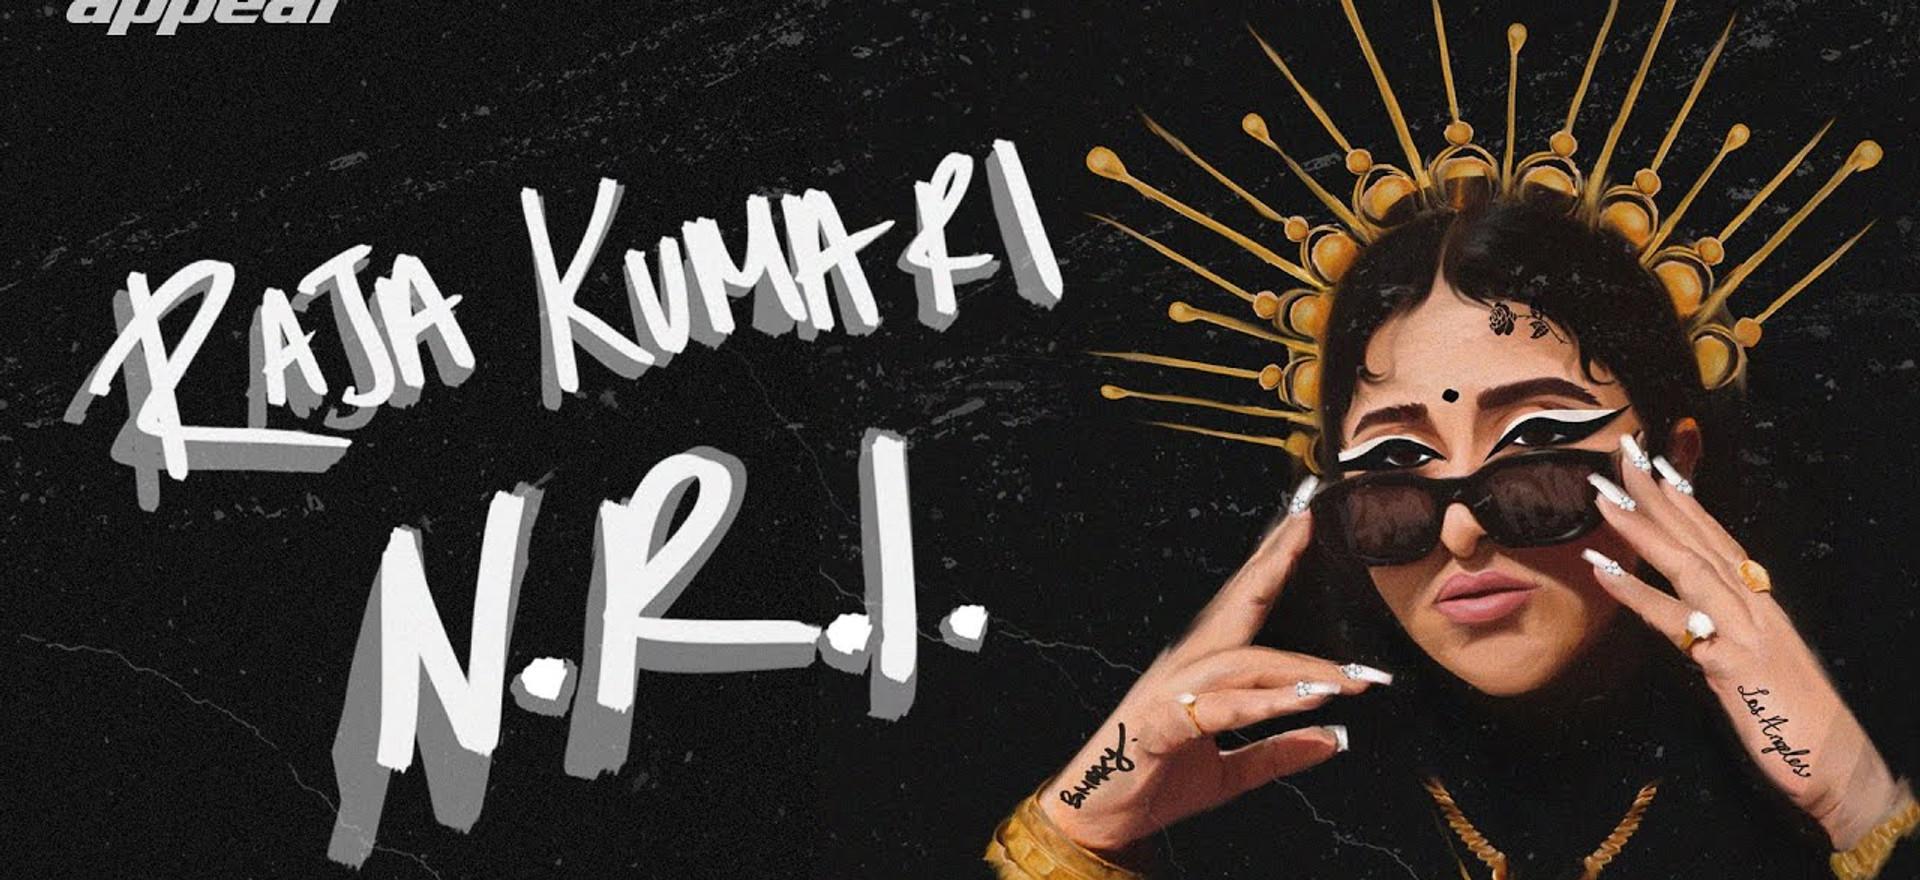 Raja Kumari - N.R.I.   Official Music Video   Mass Appeal India